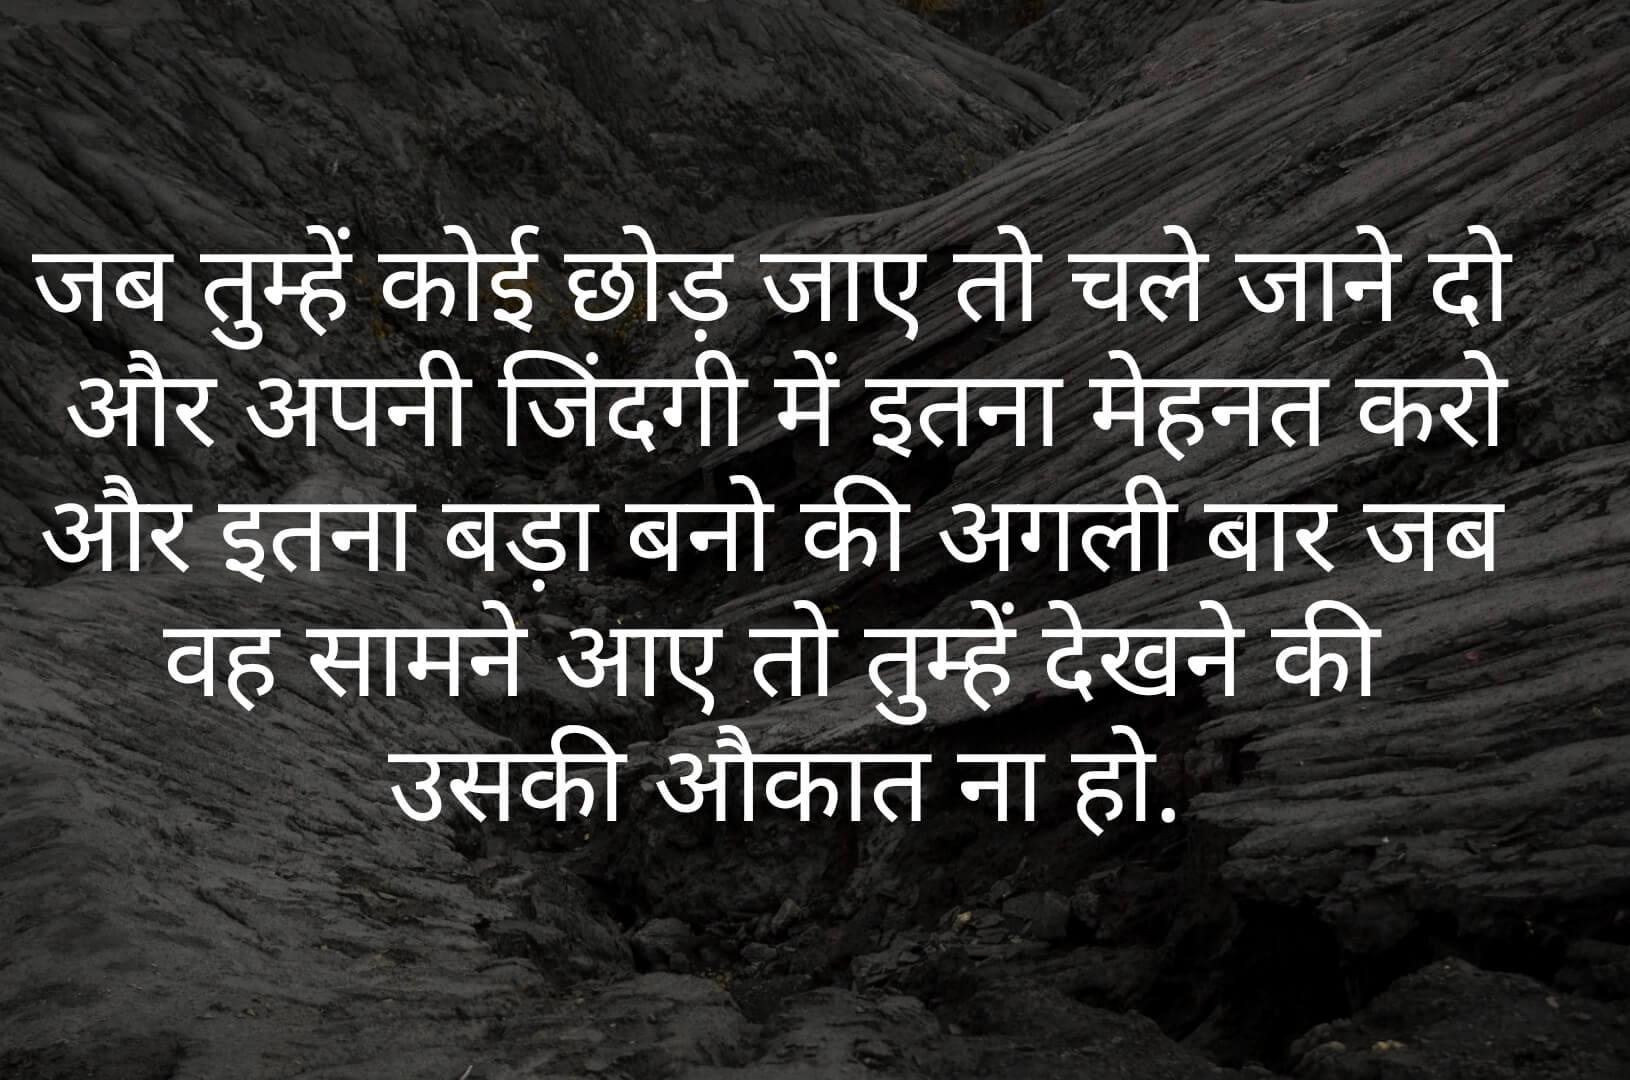 Best Motivational Shayari in Hindi on Life